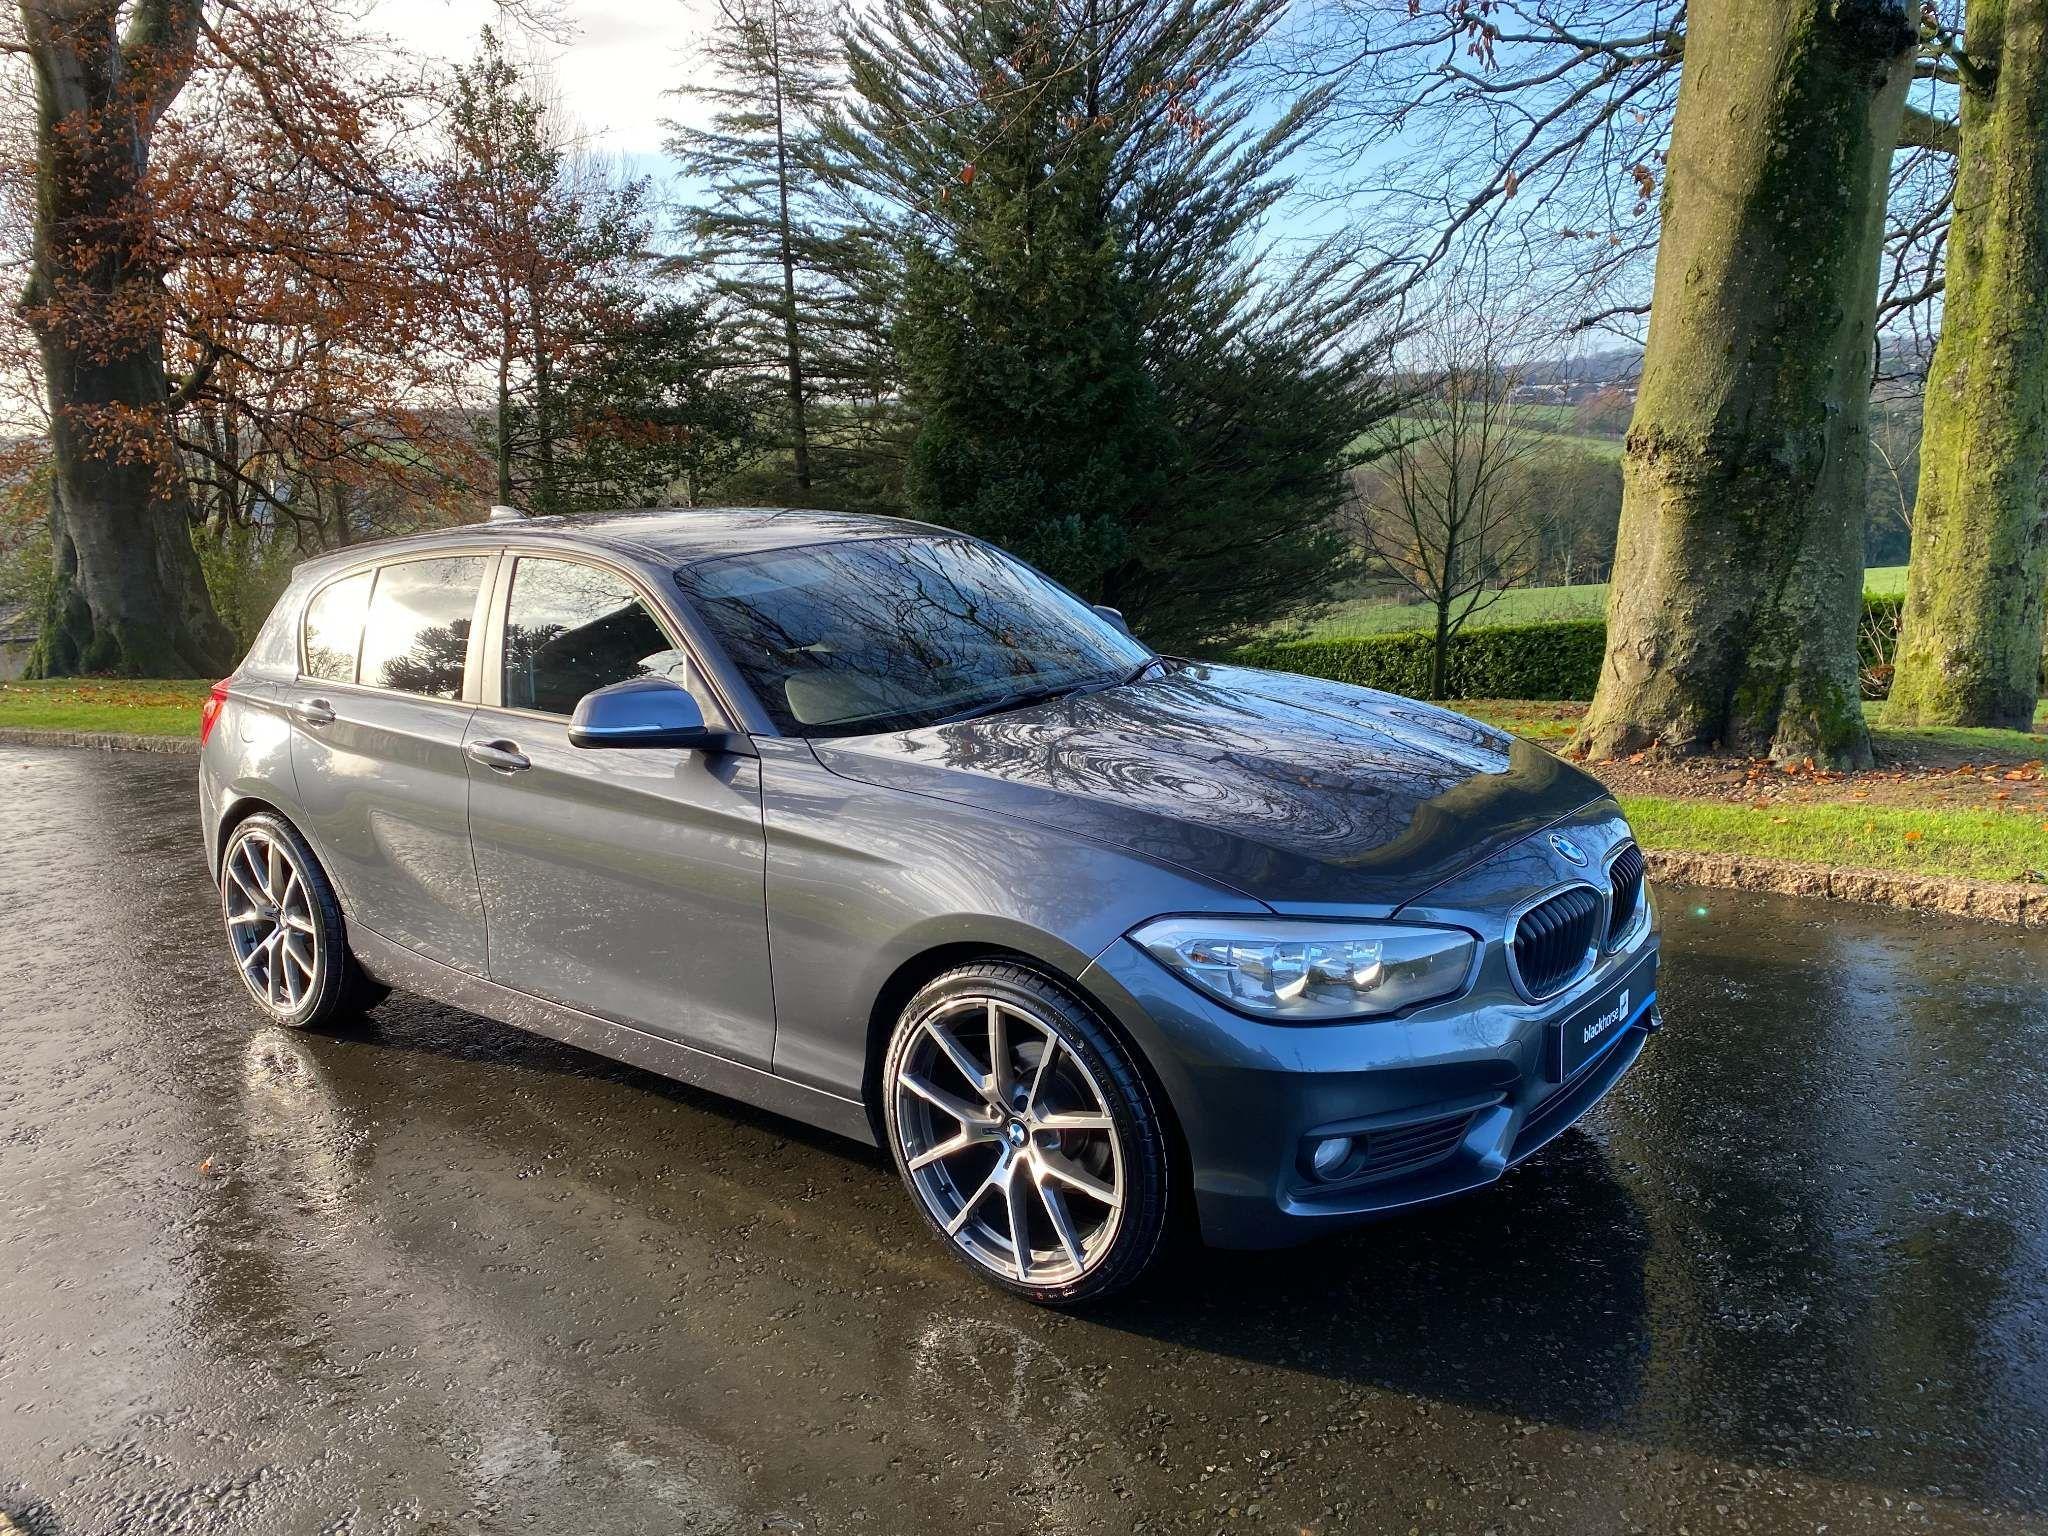 2016 BMW 1 Series 1.5 116d ED Plus (s/s) 5dr Diesel Manual – Moyway Motors Dungannon full